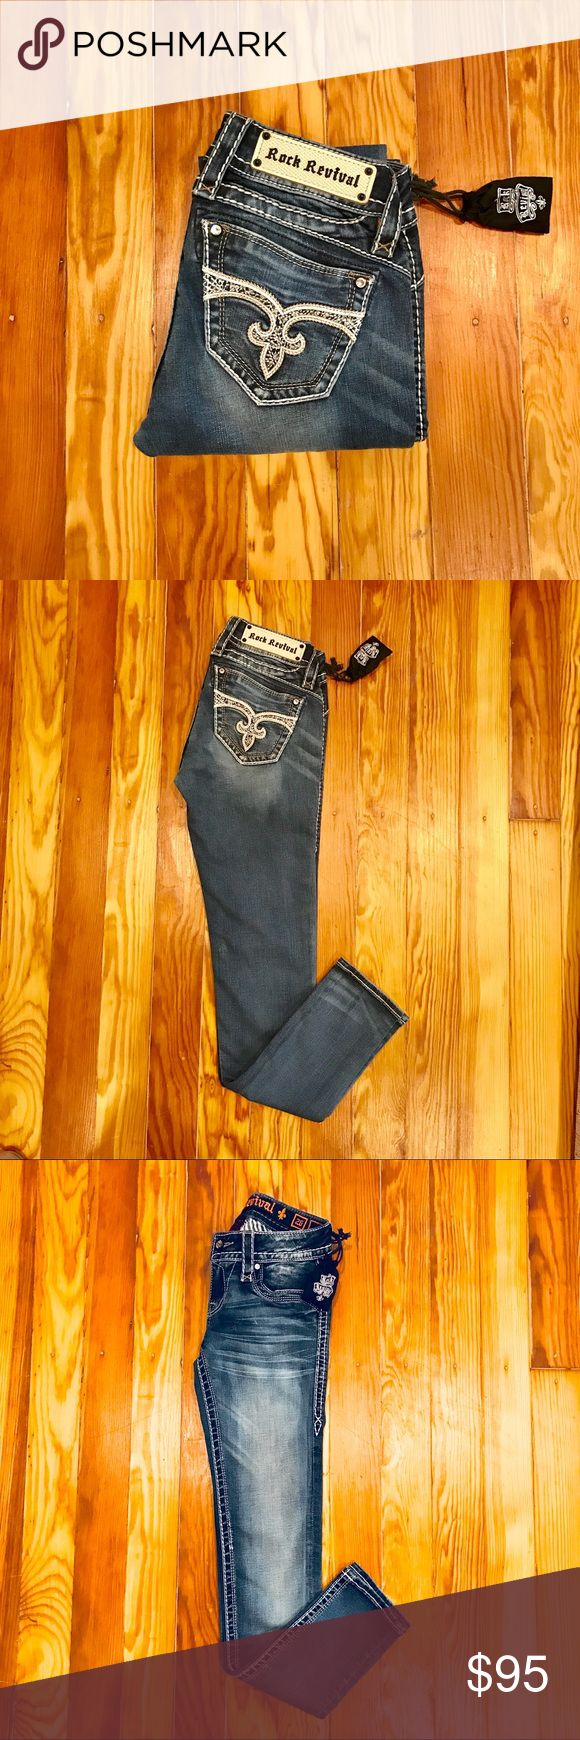 "Rock Revival- Adele Skinny Jeans (NWT) Rock Revival- Adele Skinny Jeans (NWT) Mid-Wash 31"" inseam Rock Revival Jeans Skinny"